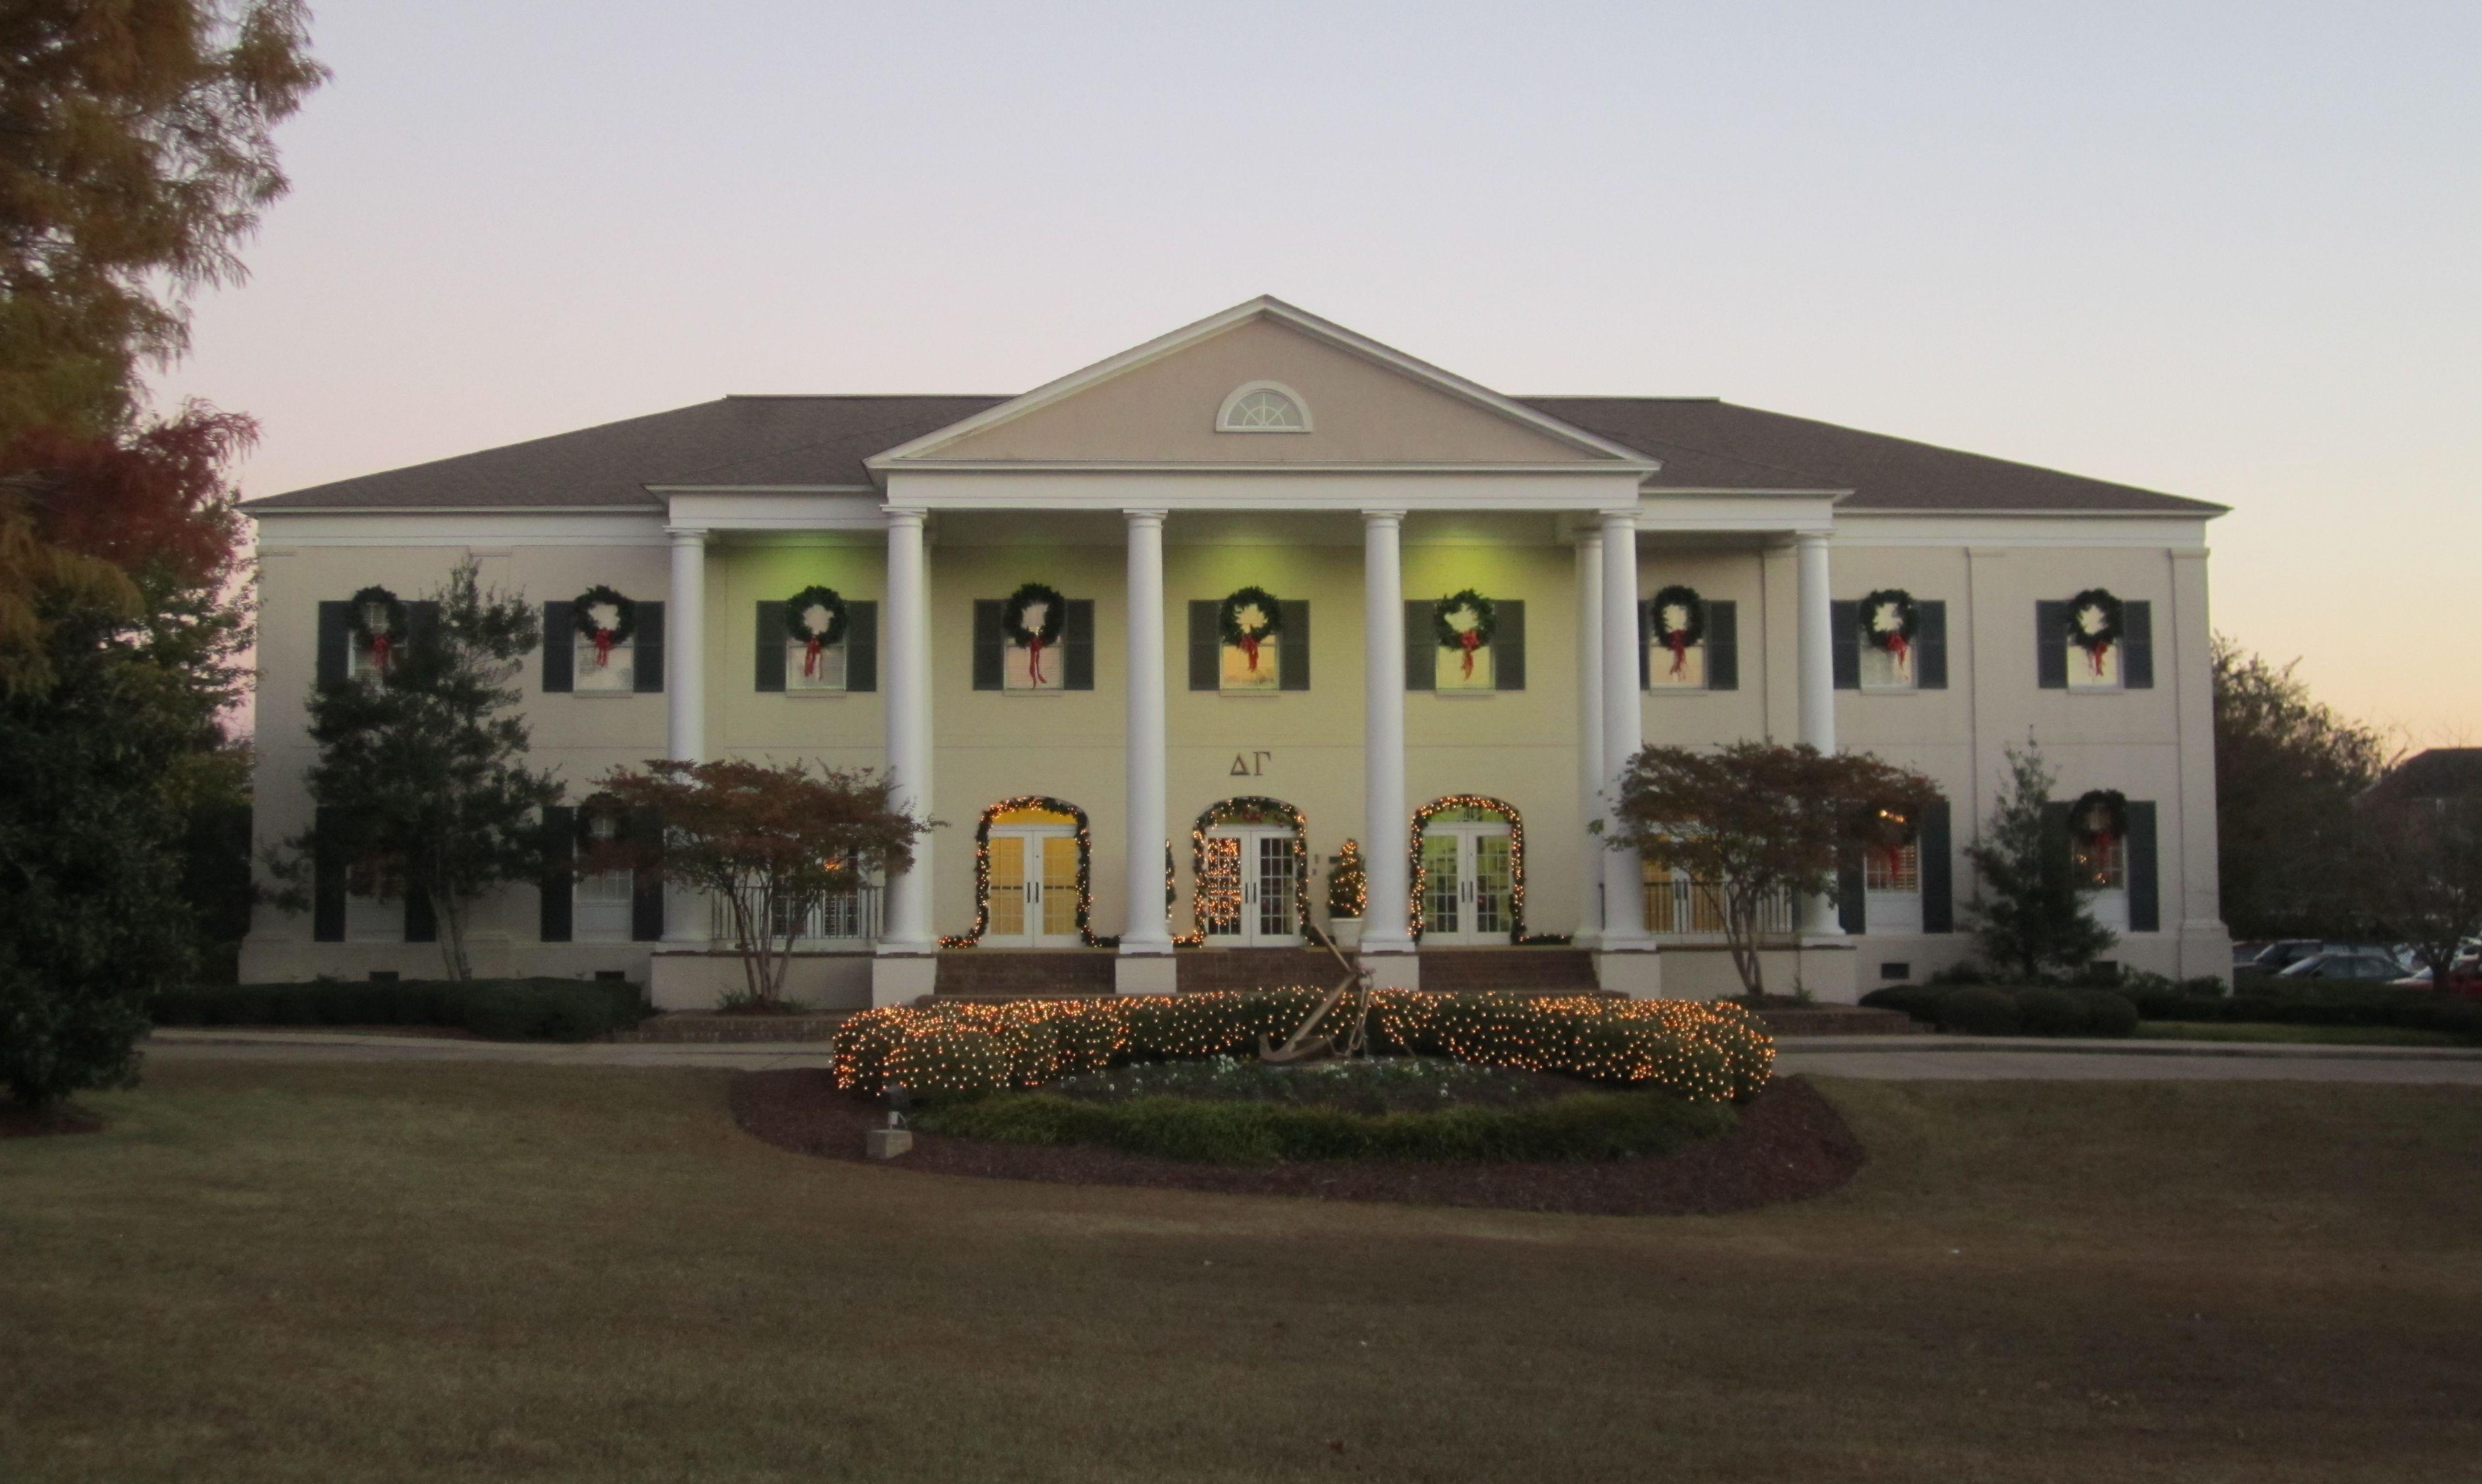 Tis The Season At The Delta Gamma House Delta Gamma House Mississippi State University